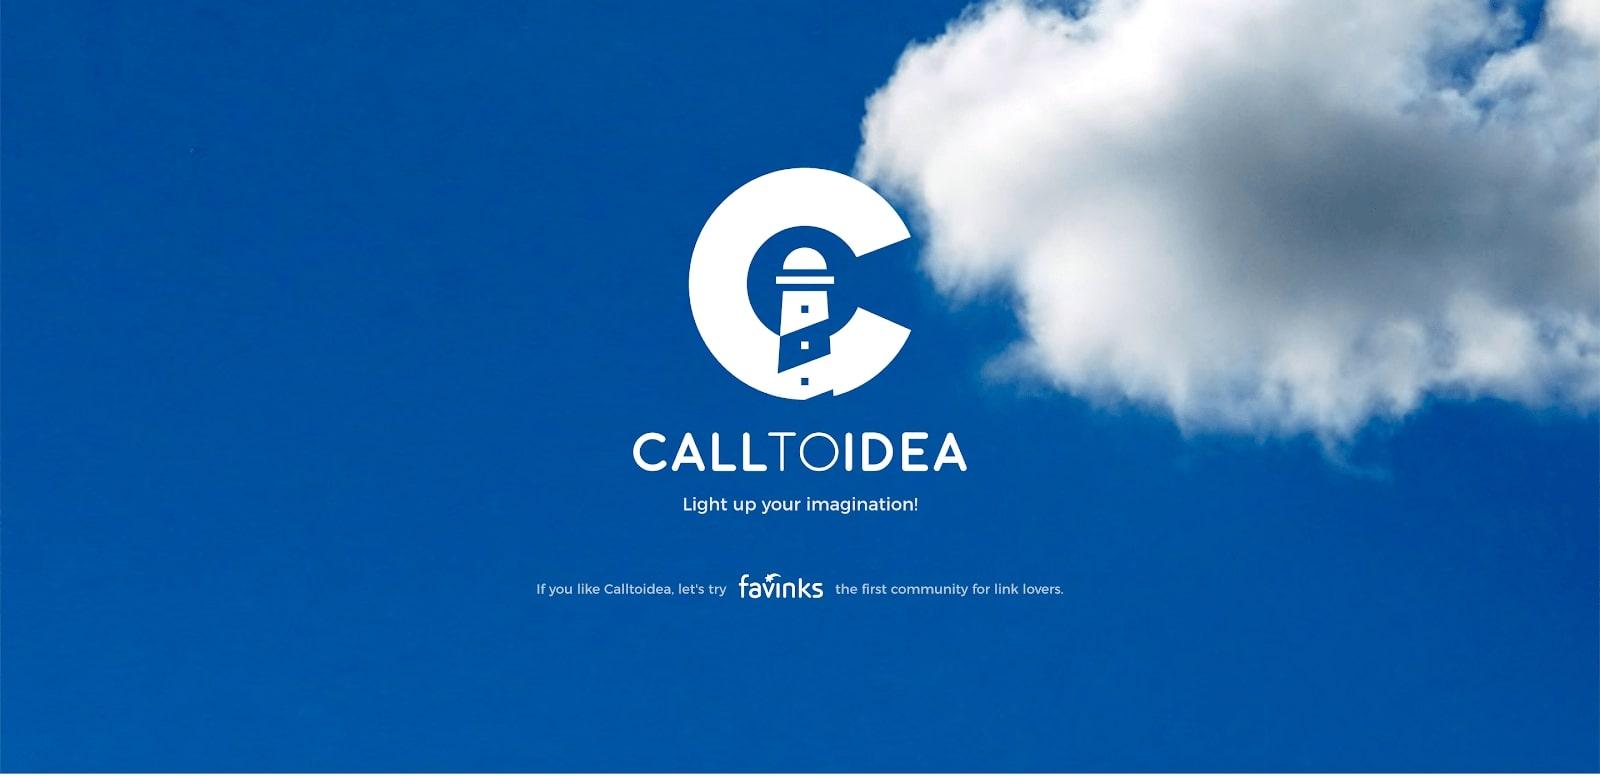 calltoidea